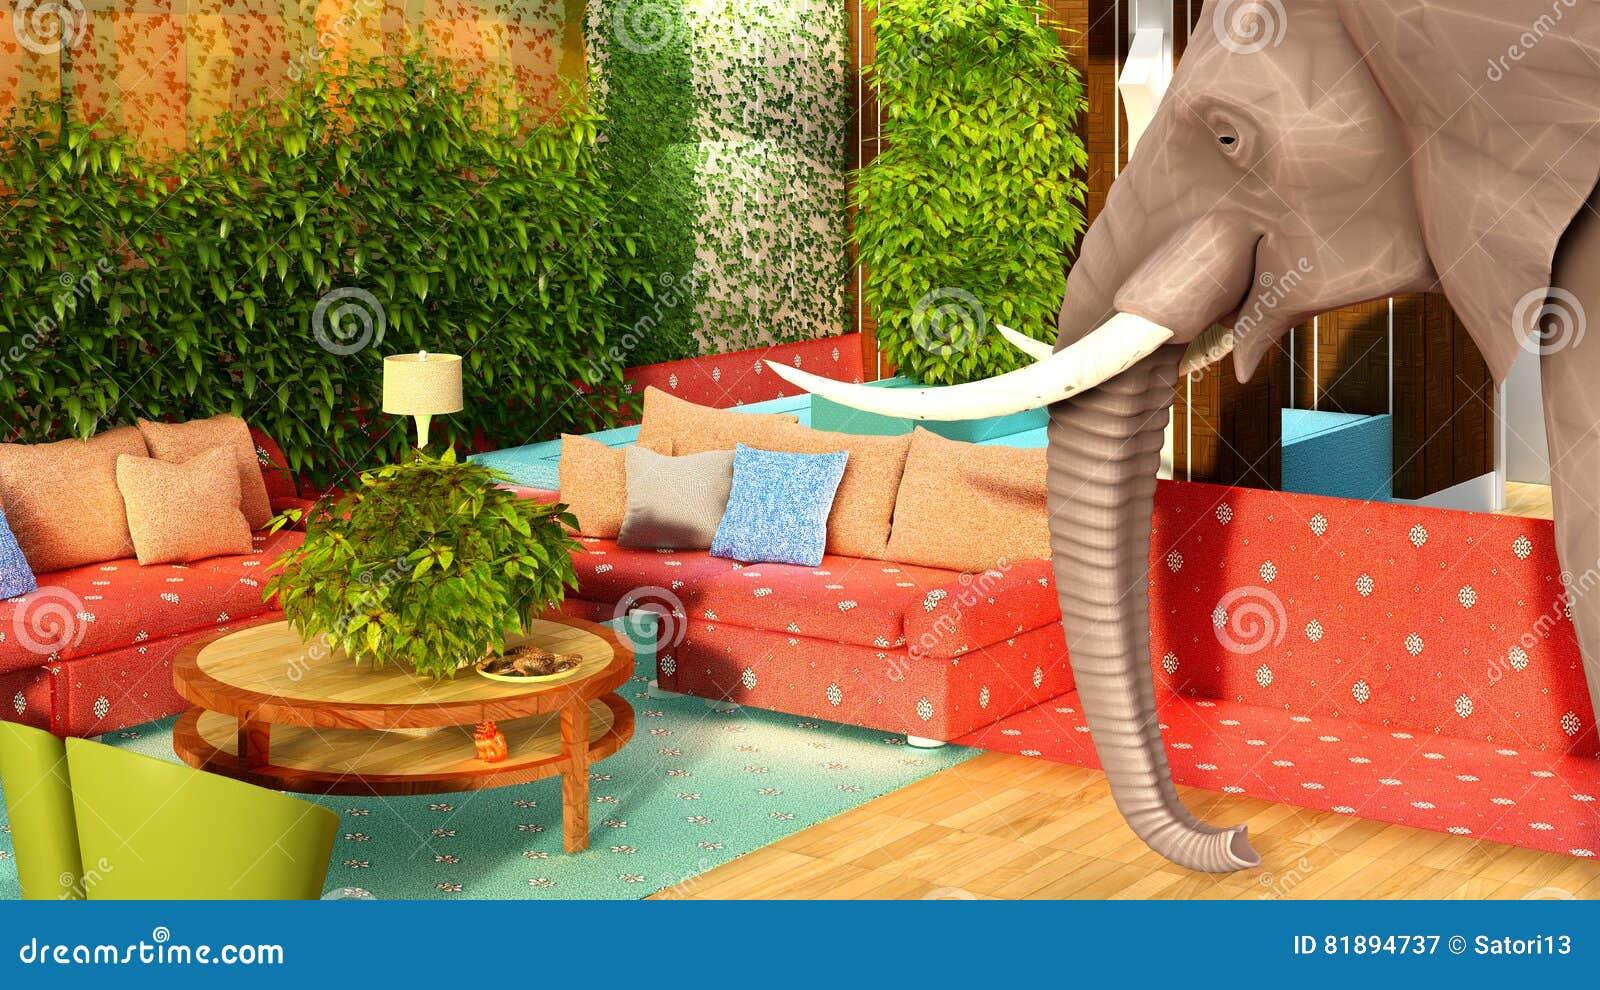 Illustration: Pink Elephant In The Living Room 3D Rendering